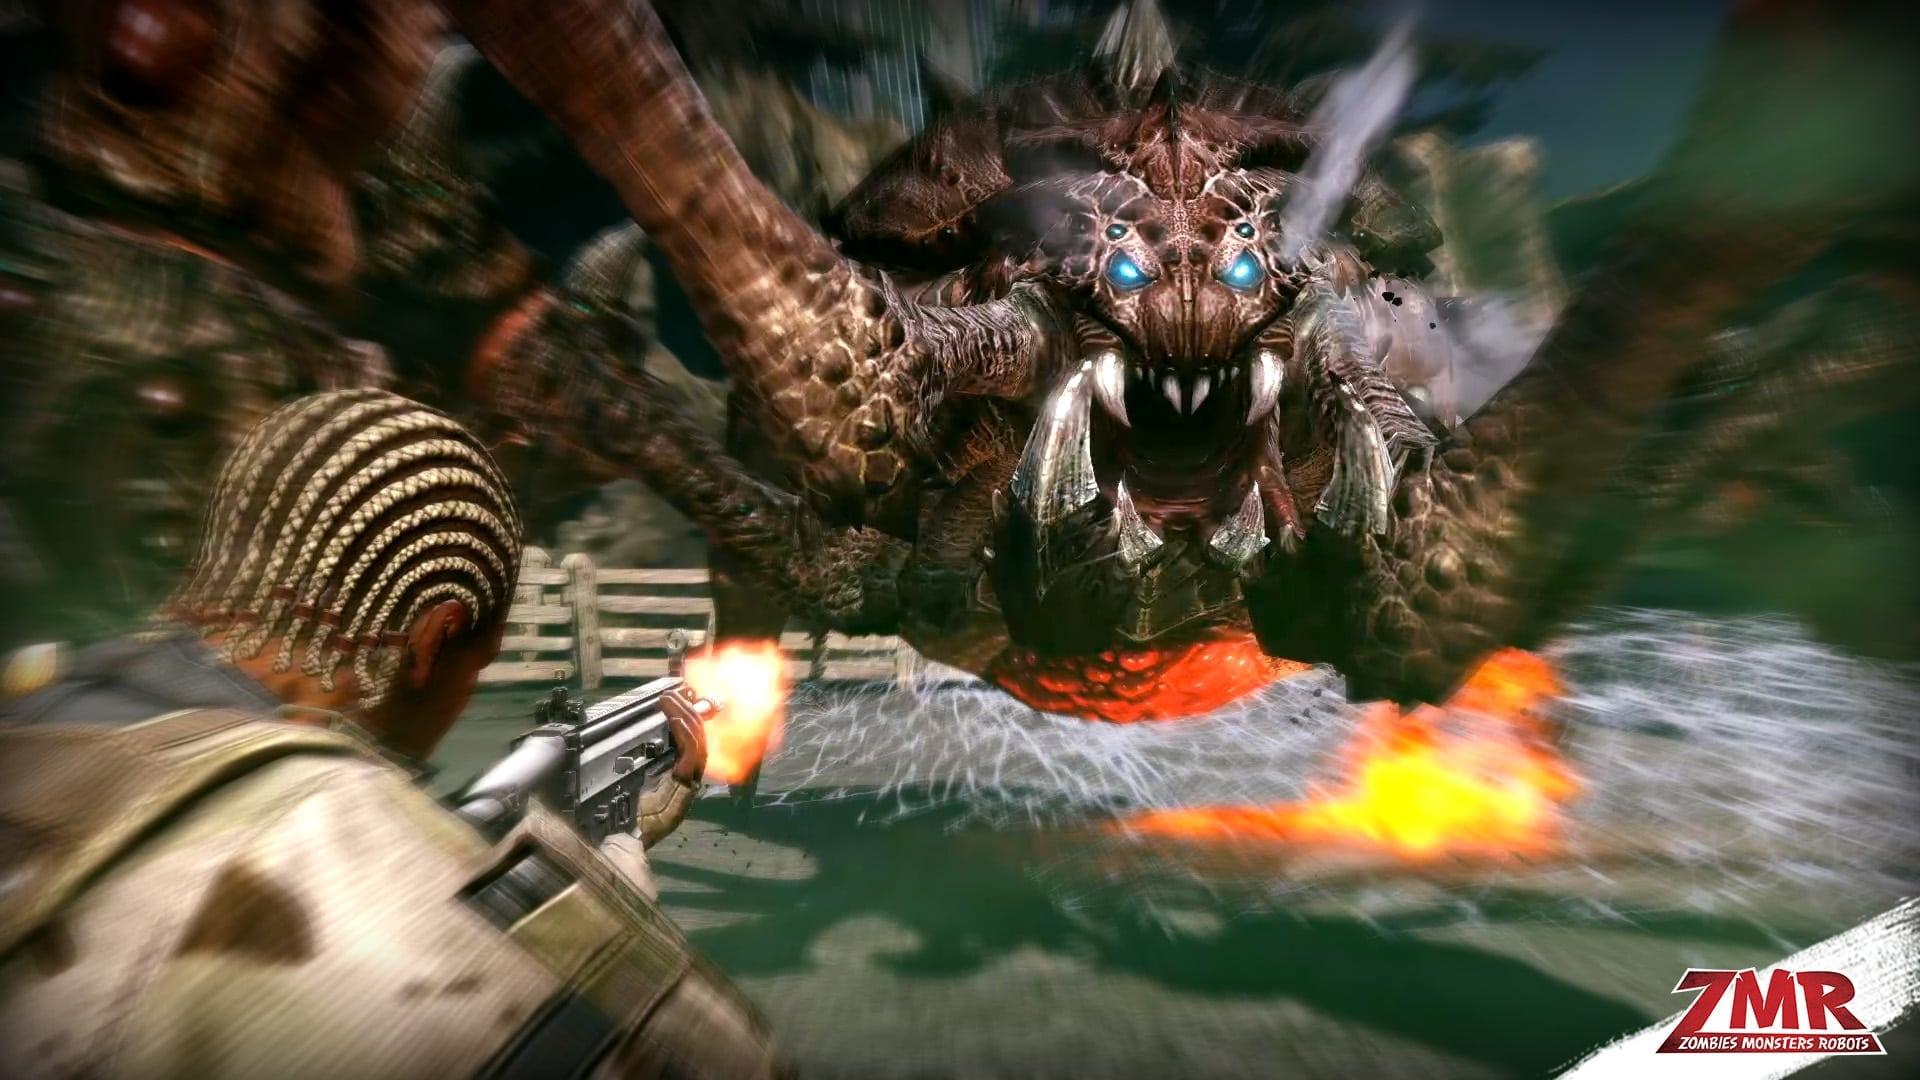 Zombbies Monsters Robots - Announcement screenshot 6